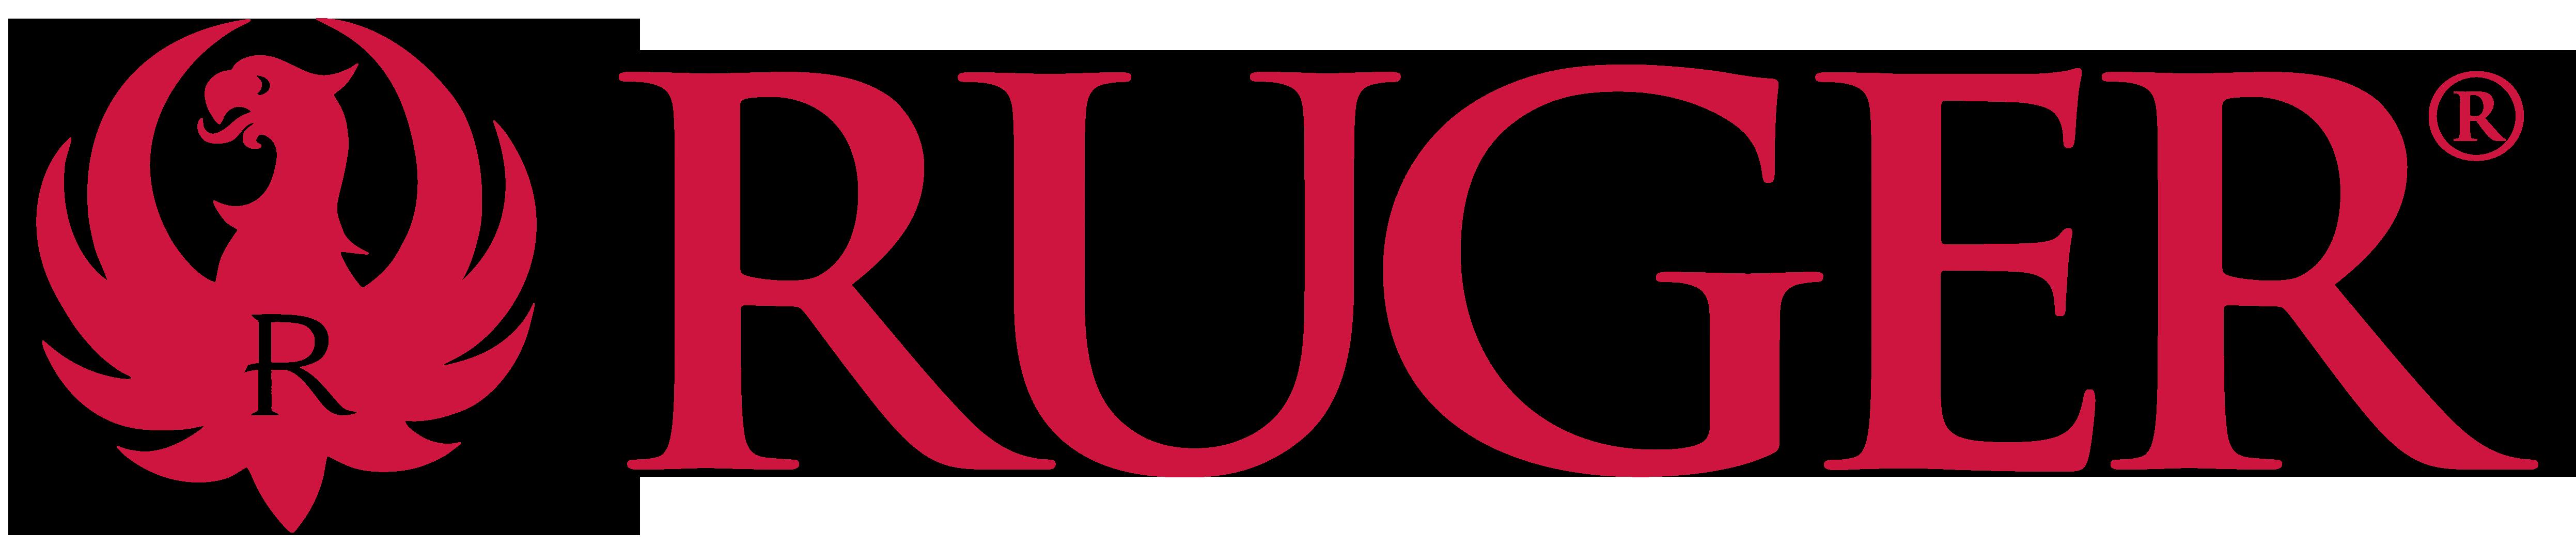 https://pacifictradinggroupllc.com/wp-content/uploads/2019/05/Ruger_logo.png